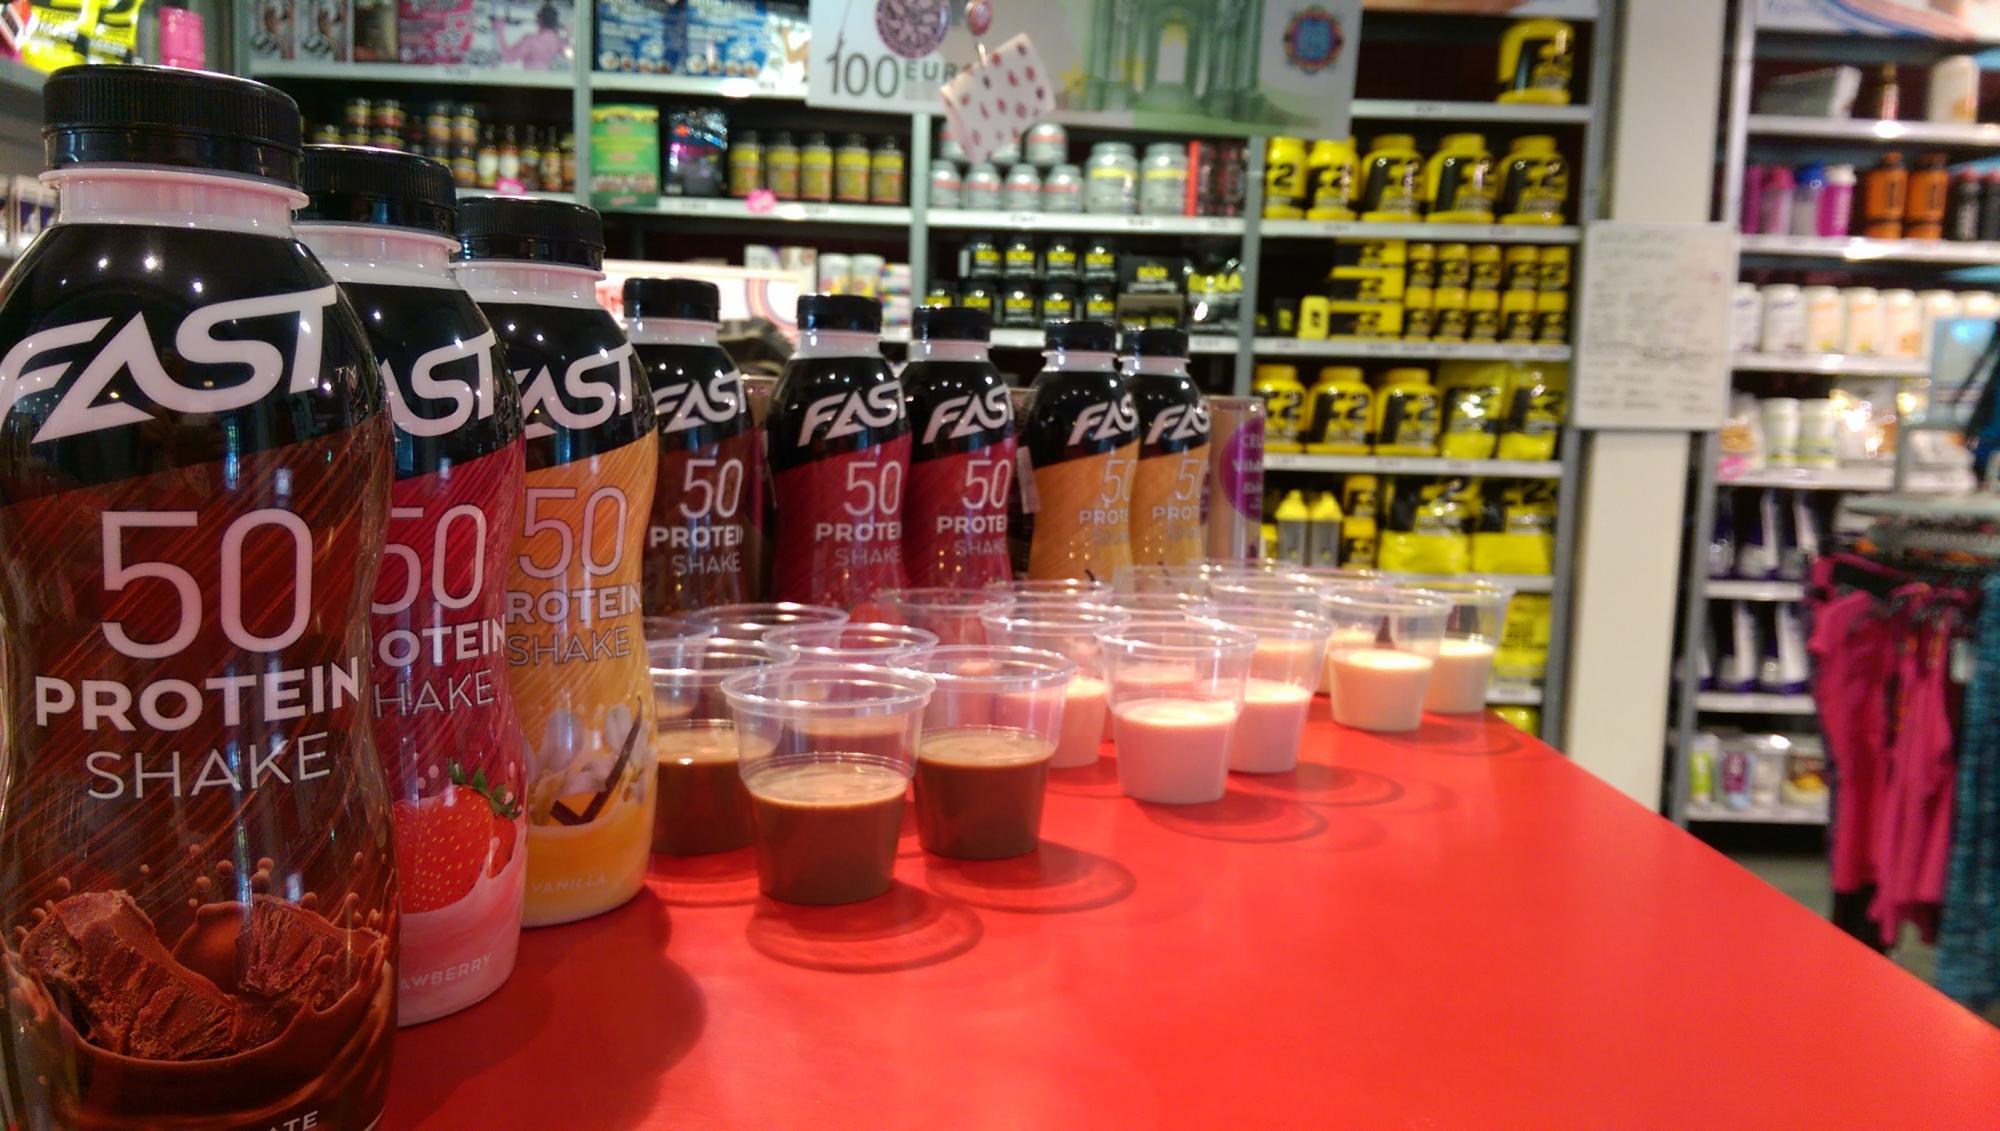 fast 50 protein shake